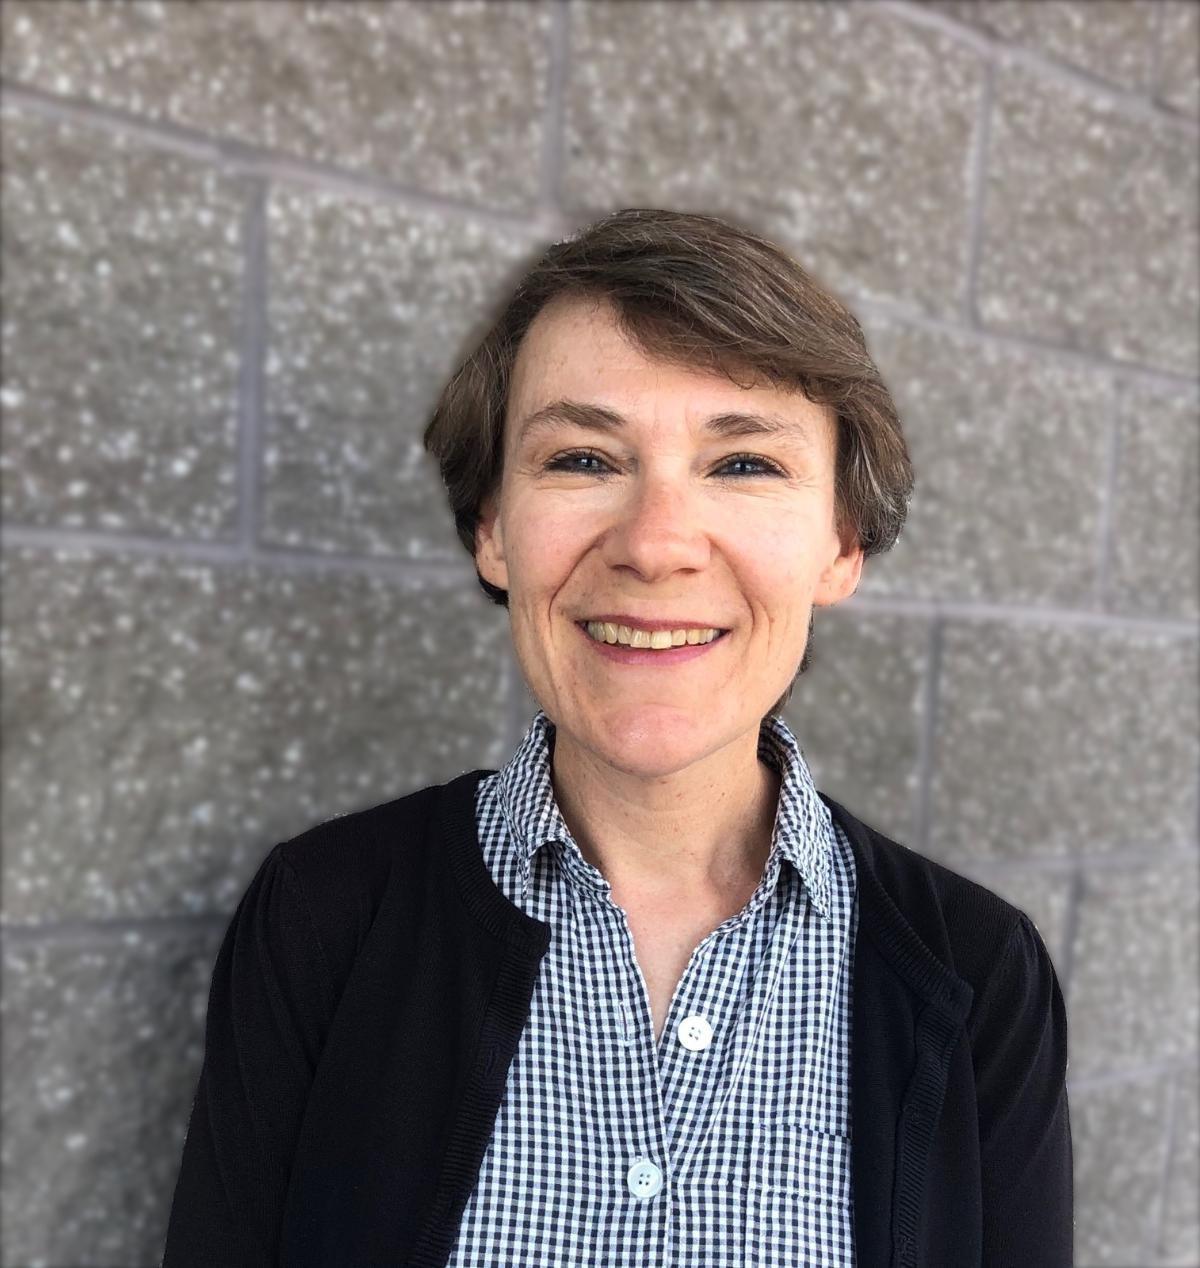 Eileen Borne